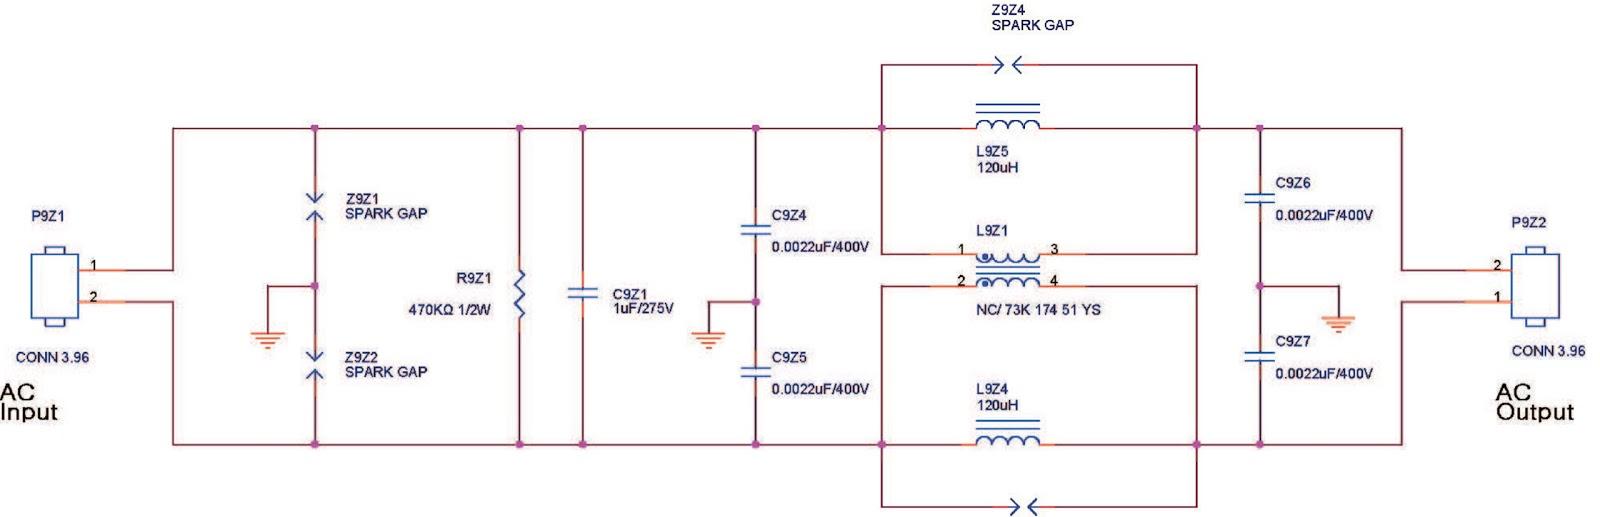 Power Ofpc Power Filter Schematic Circuit Diagram Philips